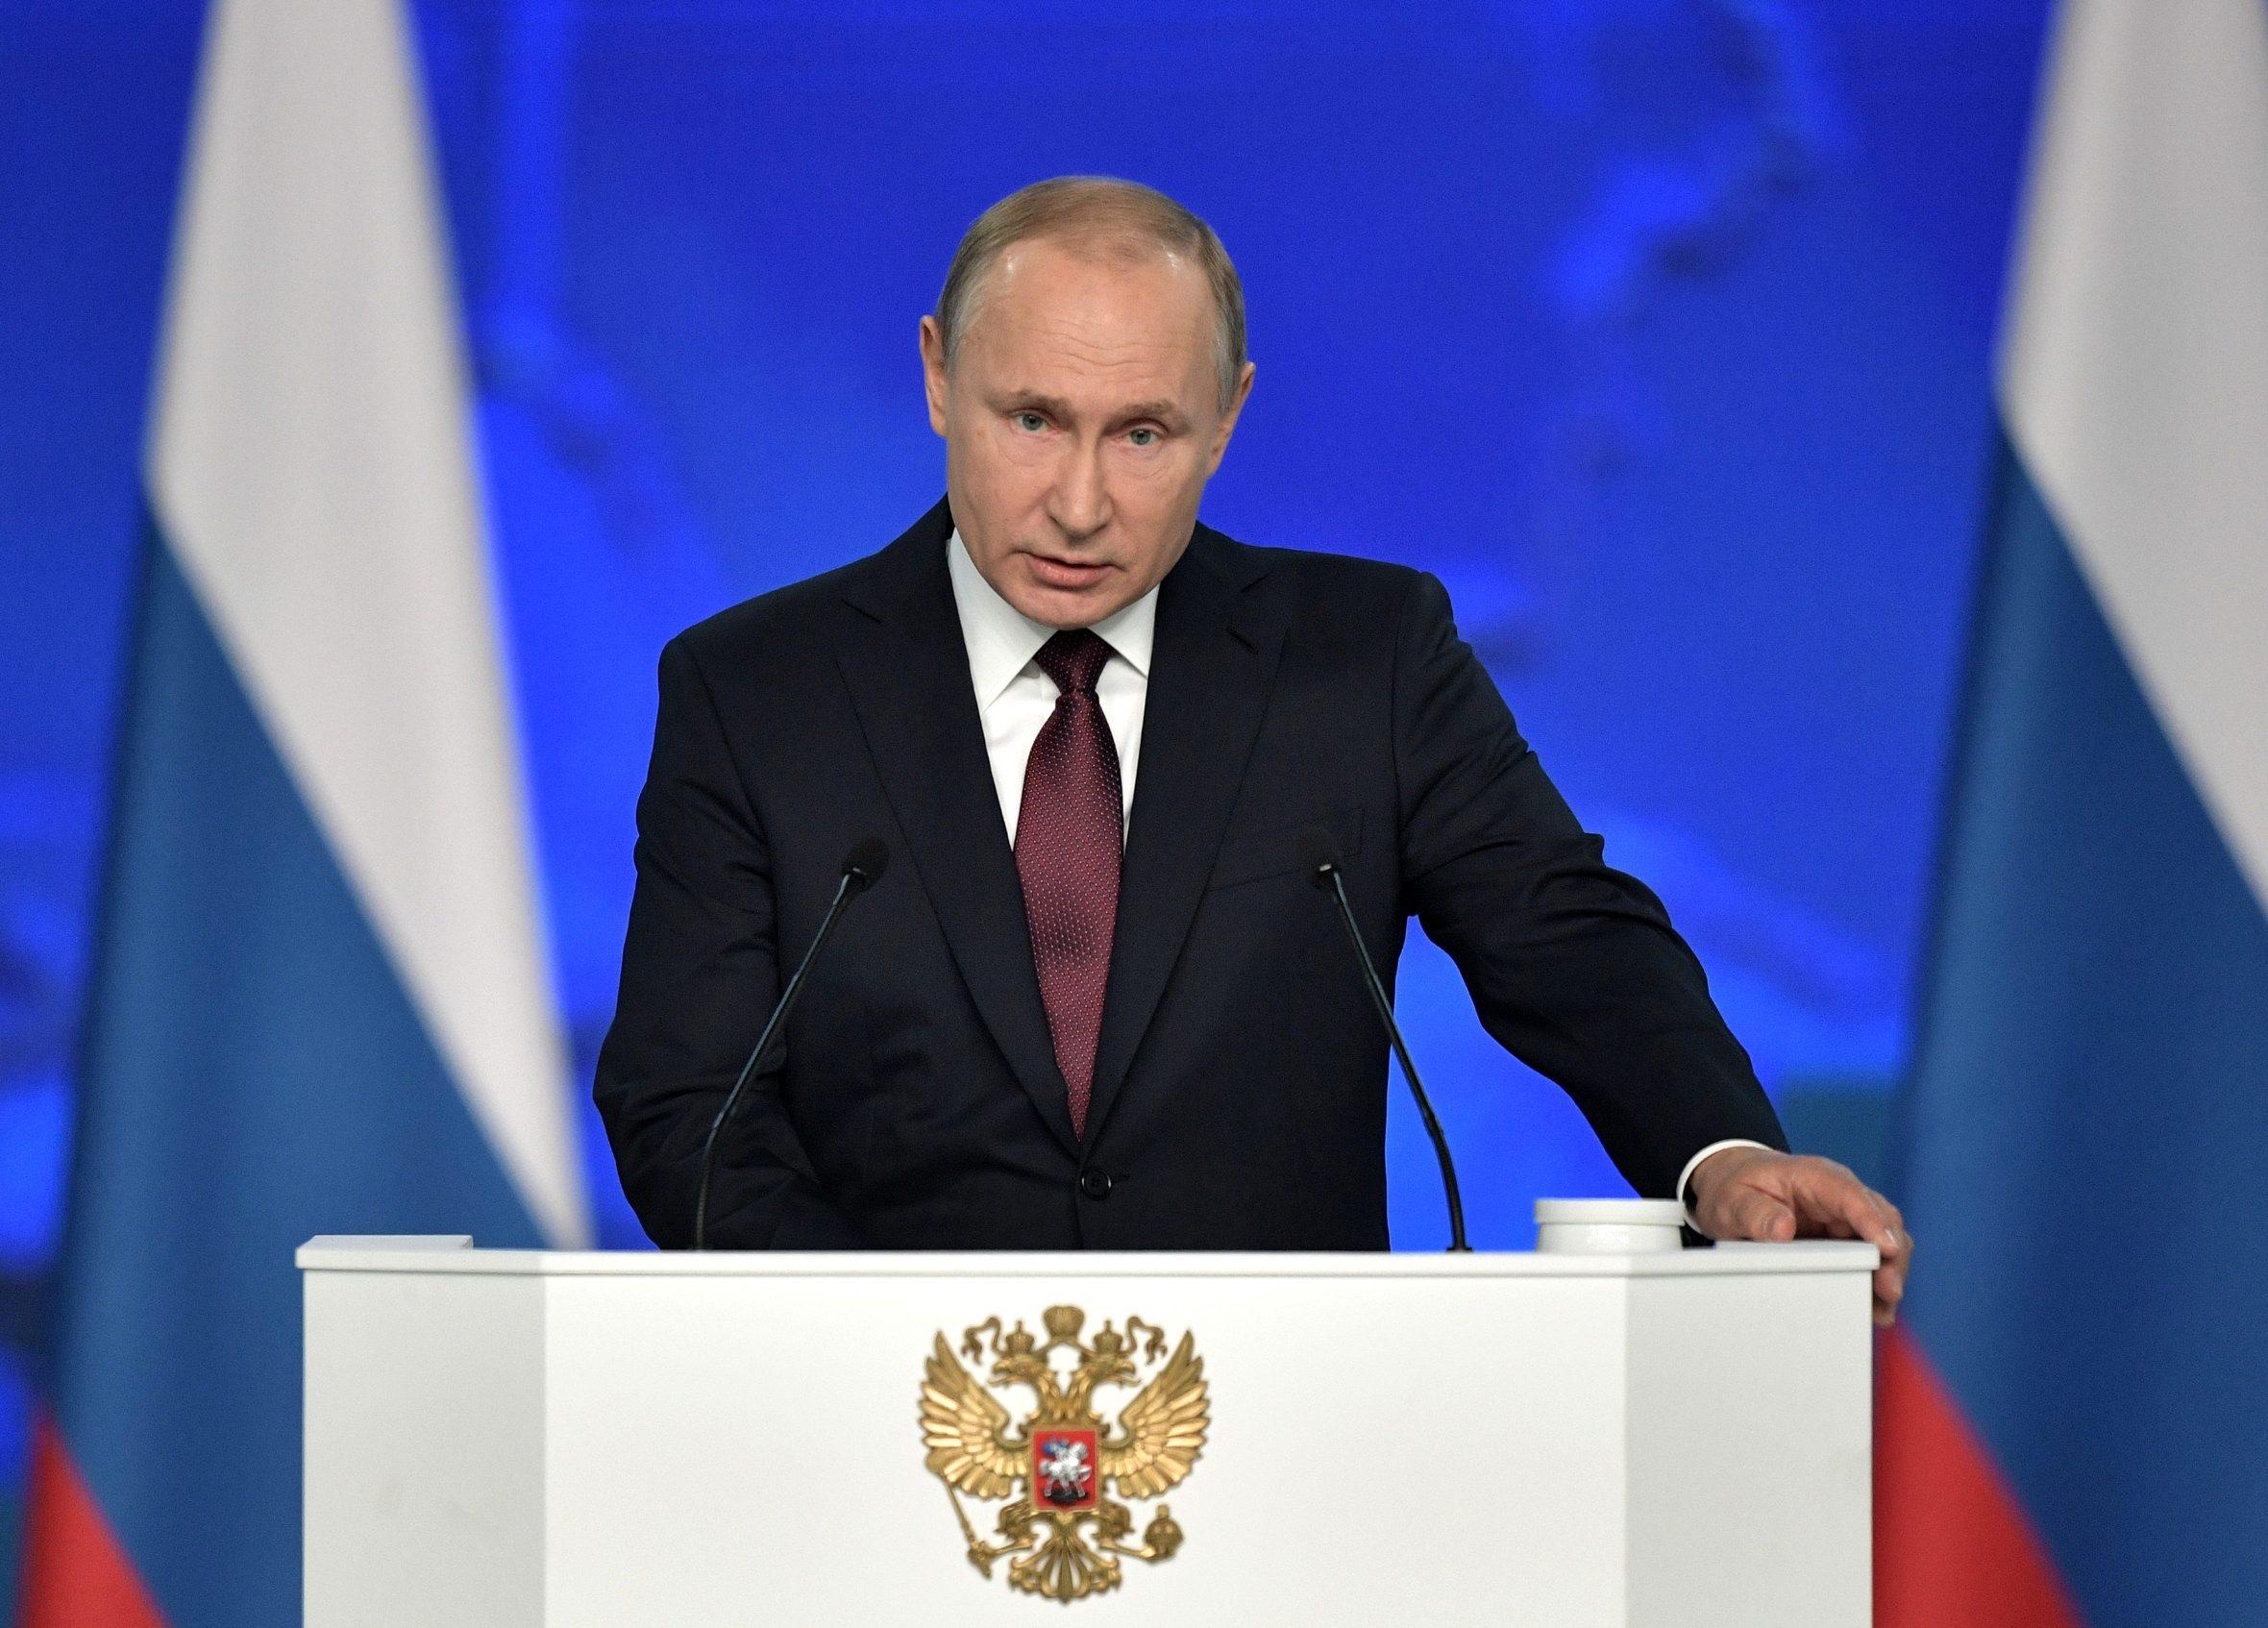 2019-02-20T102902Z_1359582931_RC13E59B8C20_RTRMADP_3_RUSSIA-PUTIN